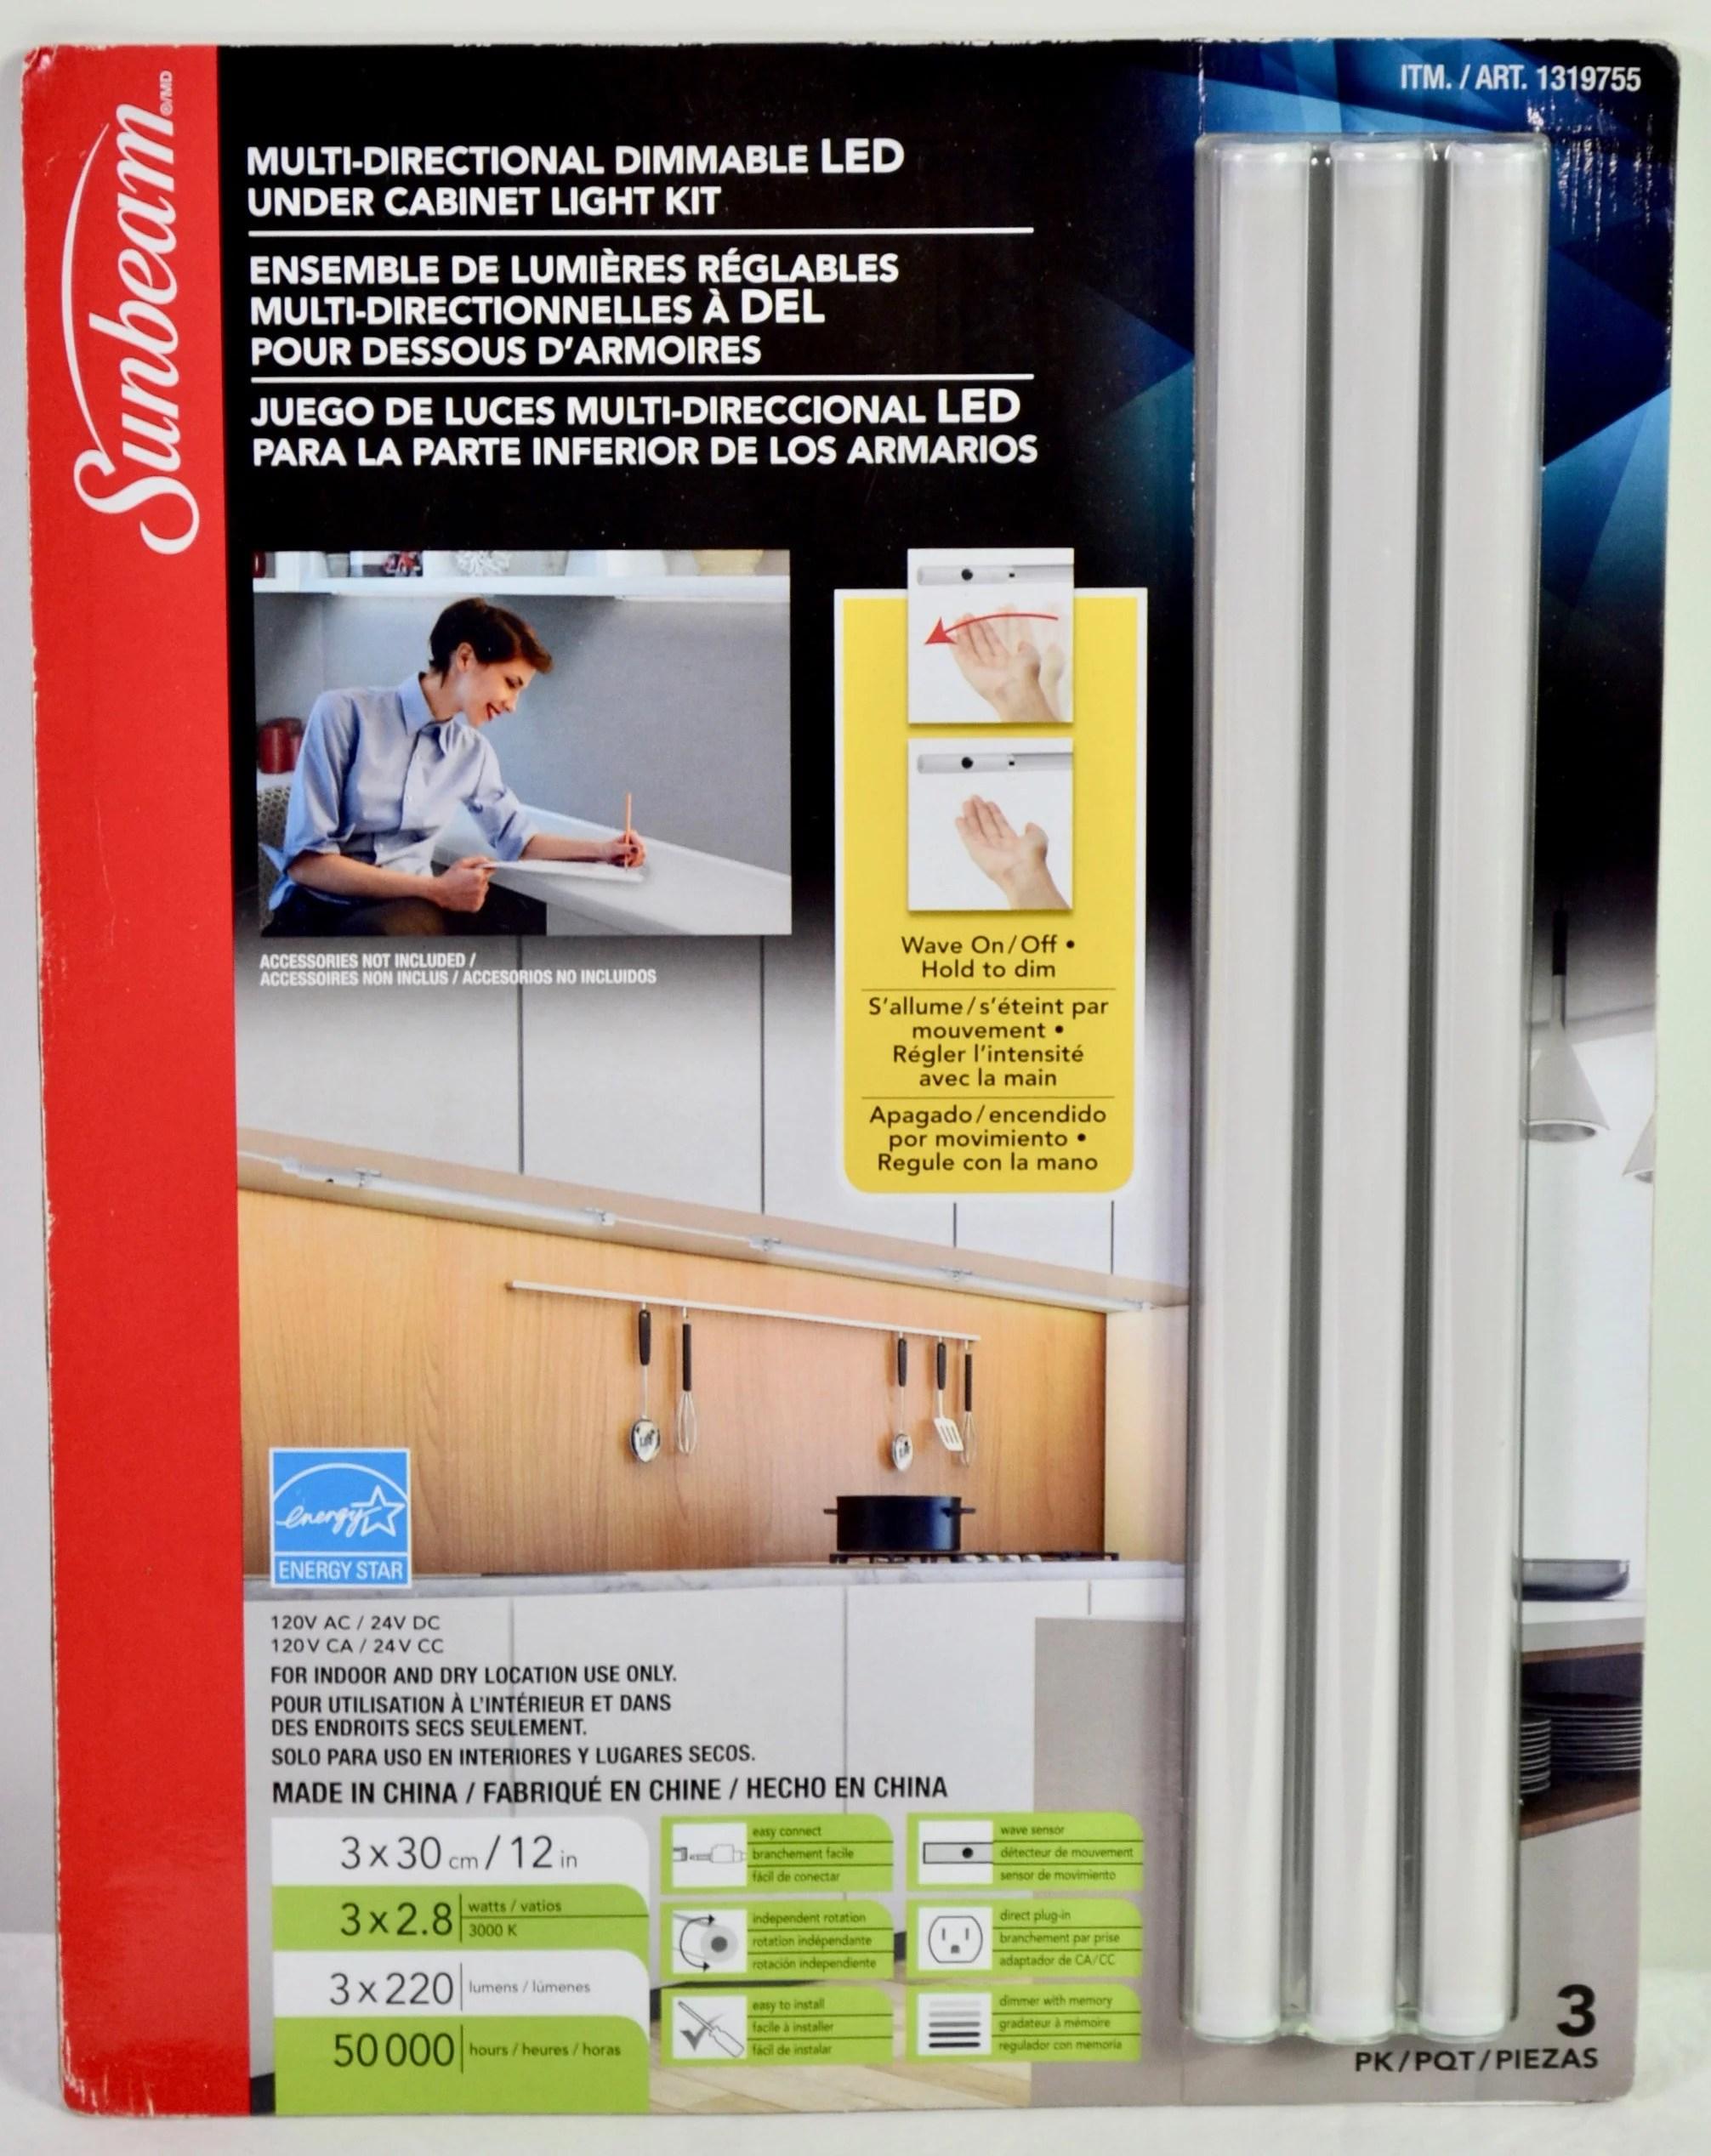 sunbeam 12 multi directional dimmable led under cabinet light kit 3 pack